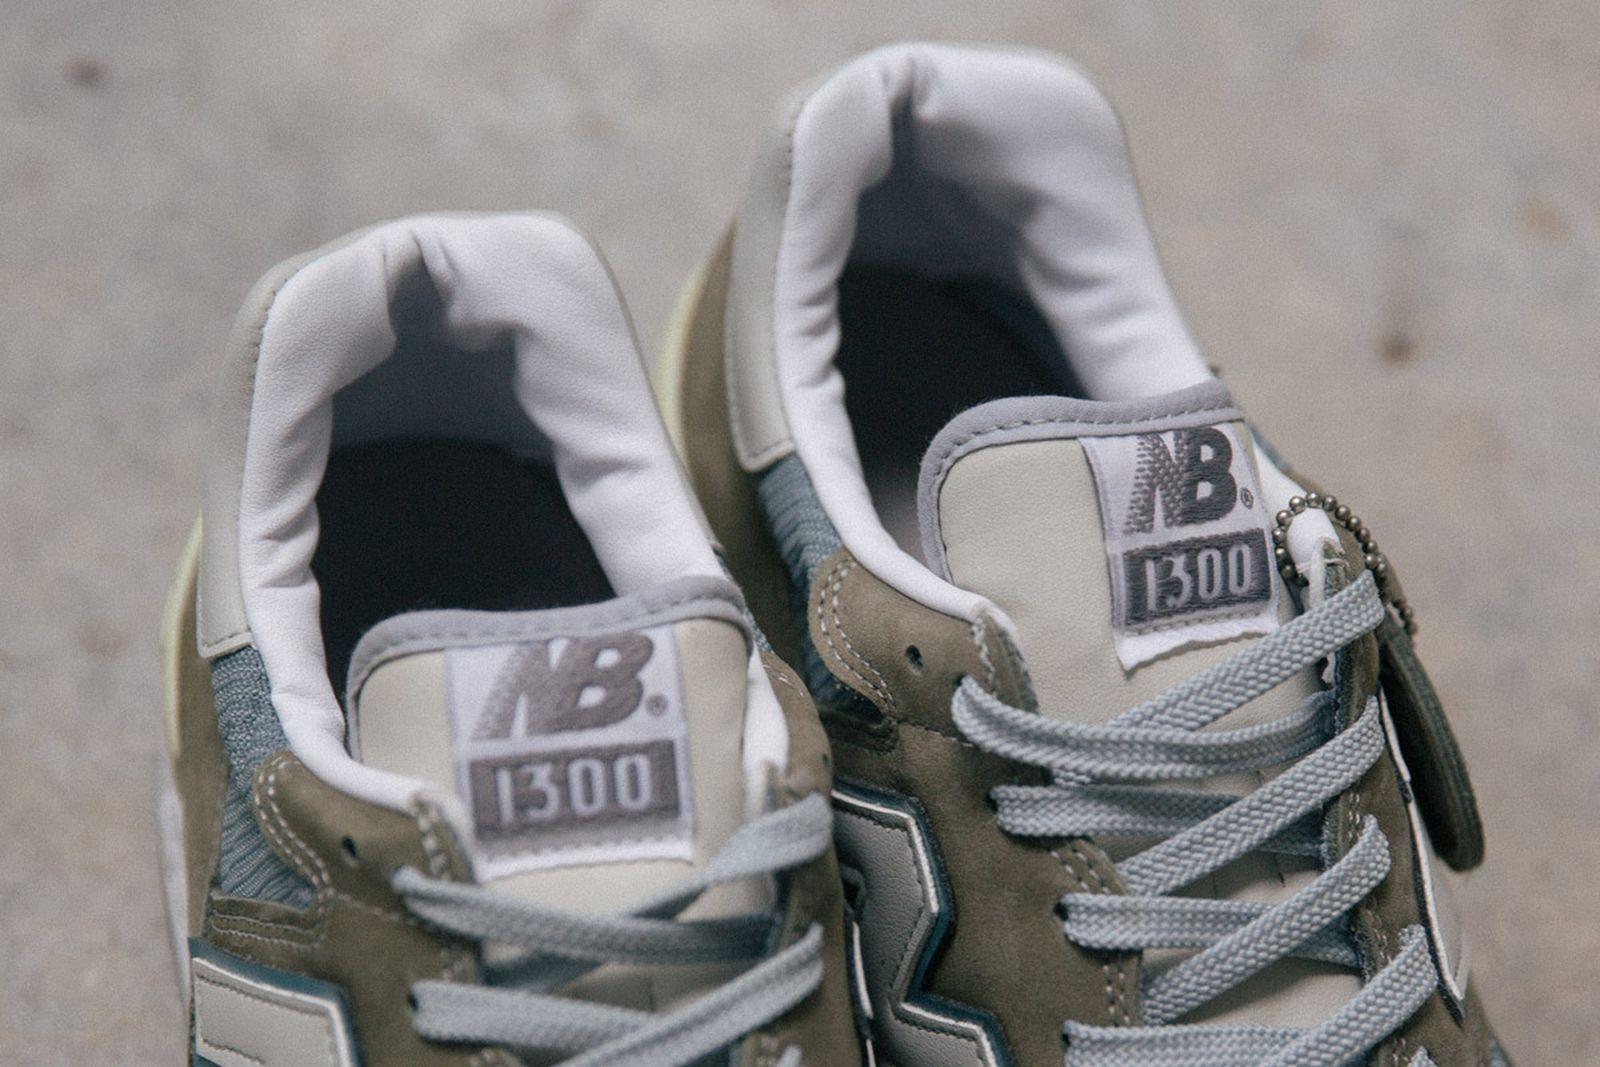 new-balance-1300-japan-04